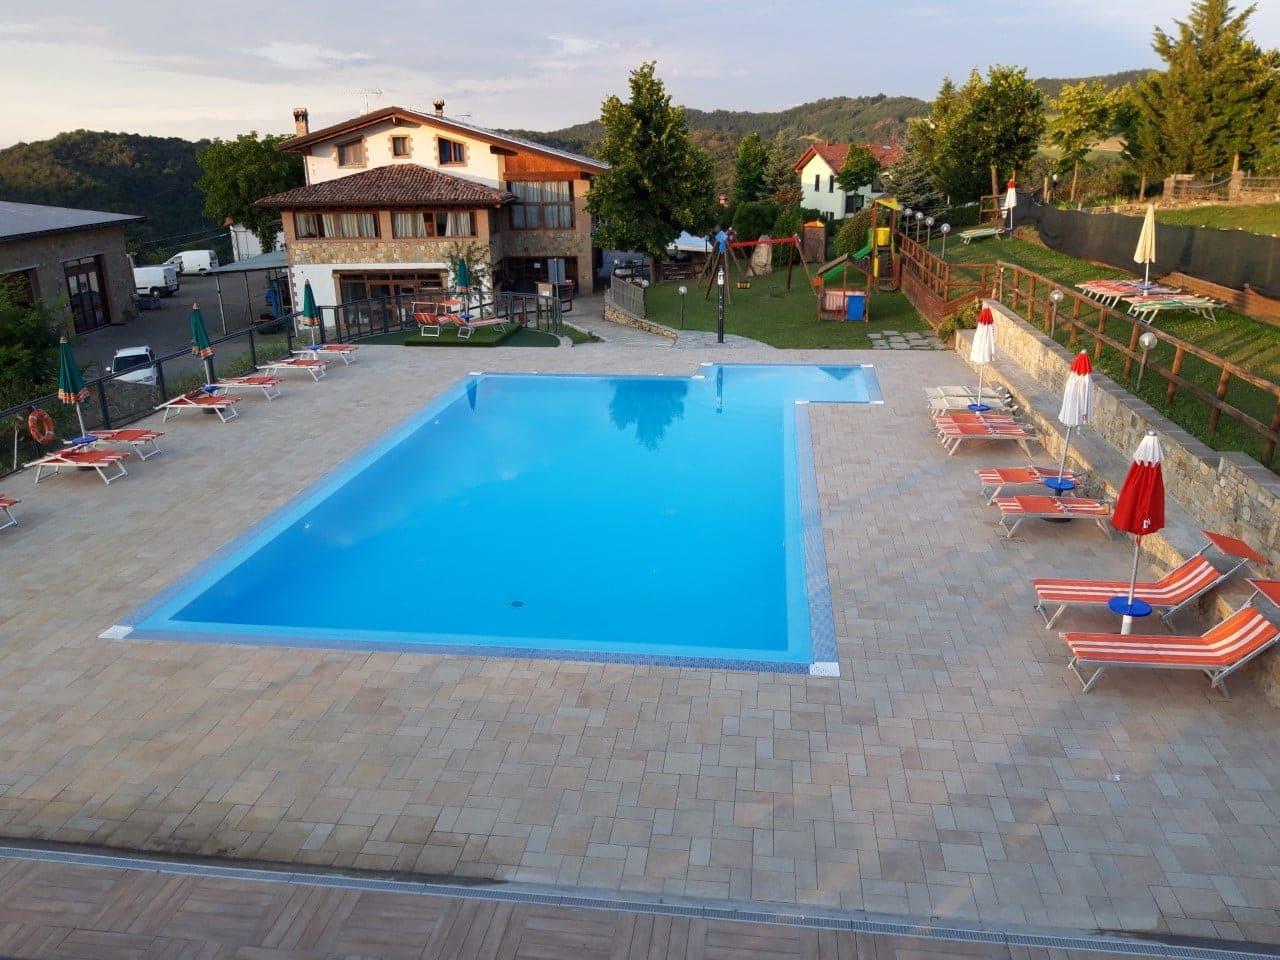 Agriturismi-con-piscina-a-Modena-Casa-Minelli